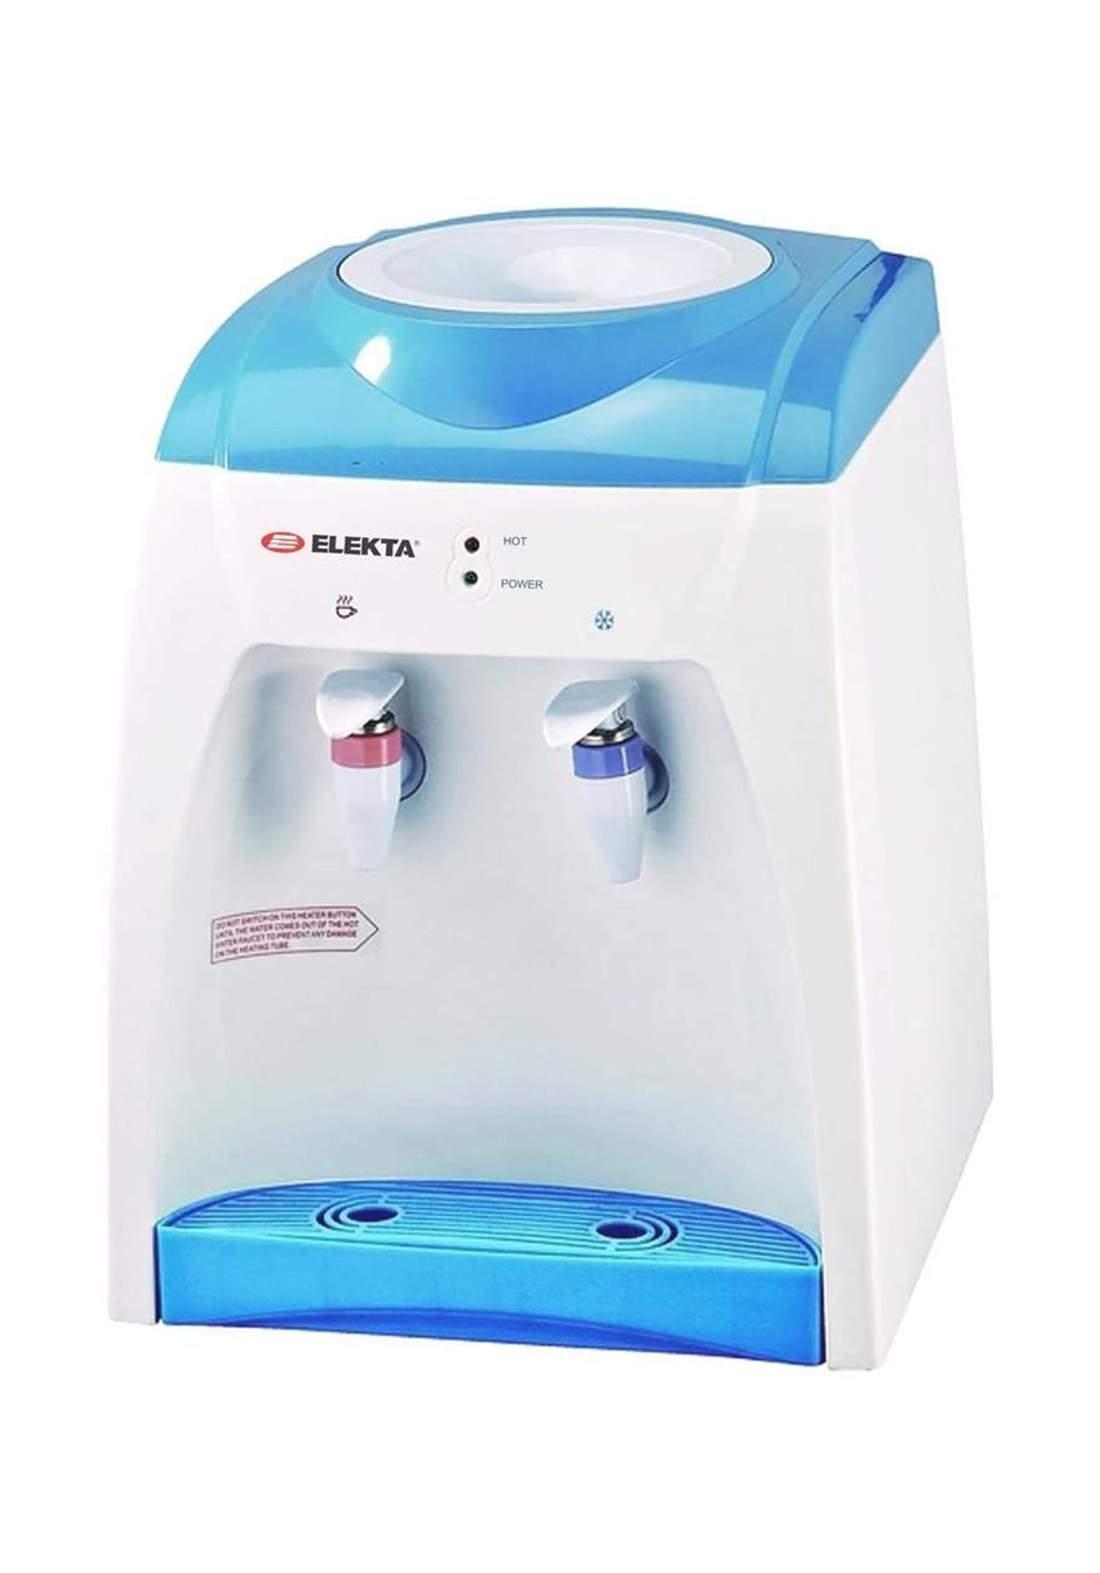 Elekta EWD-327HN Water Dispenser HOT & NORMAL Table top براد ماء